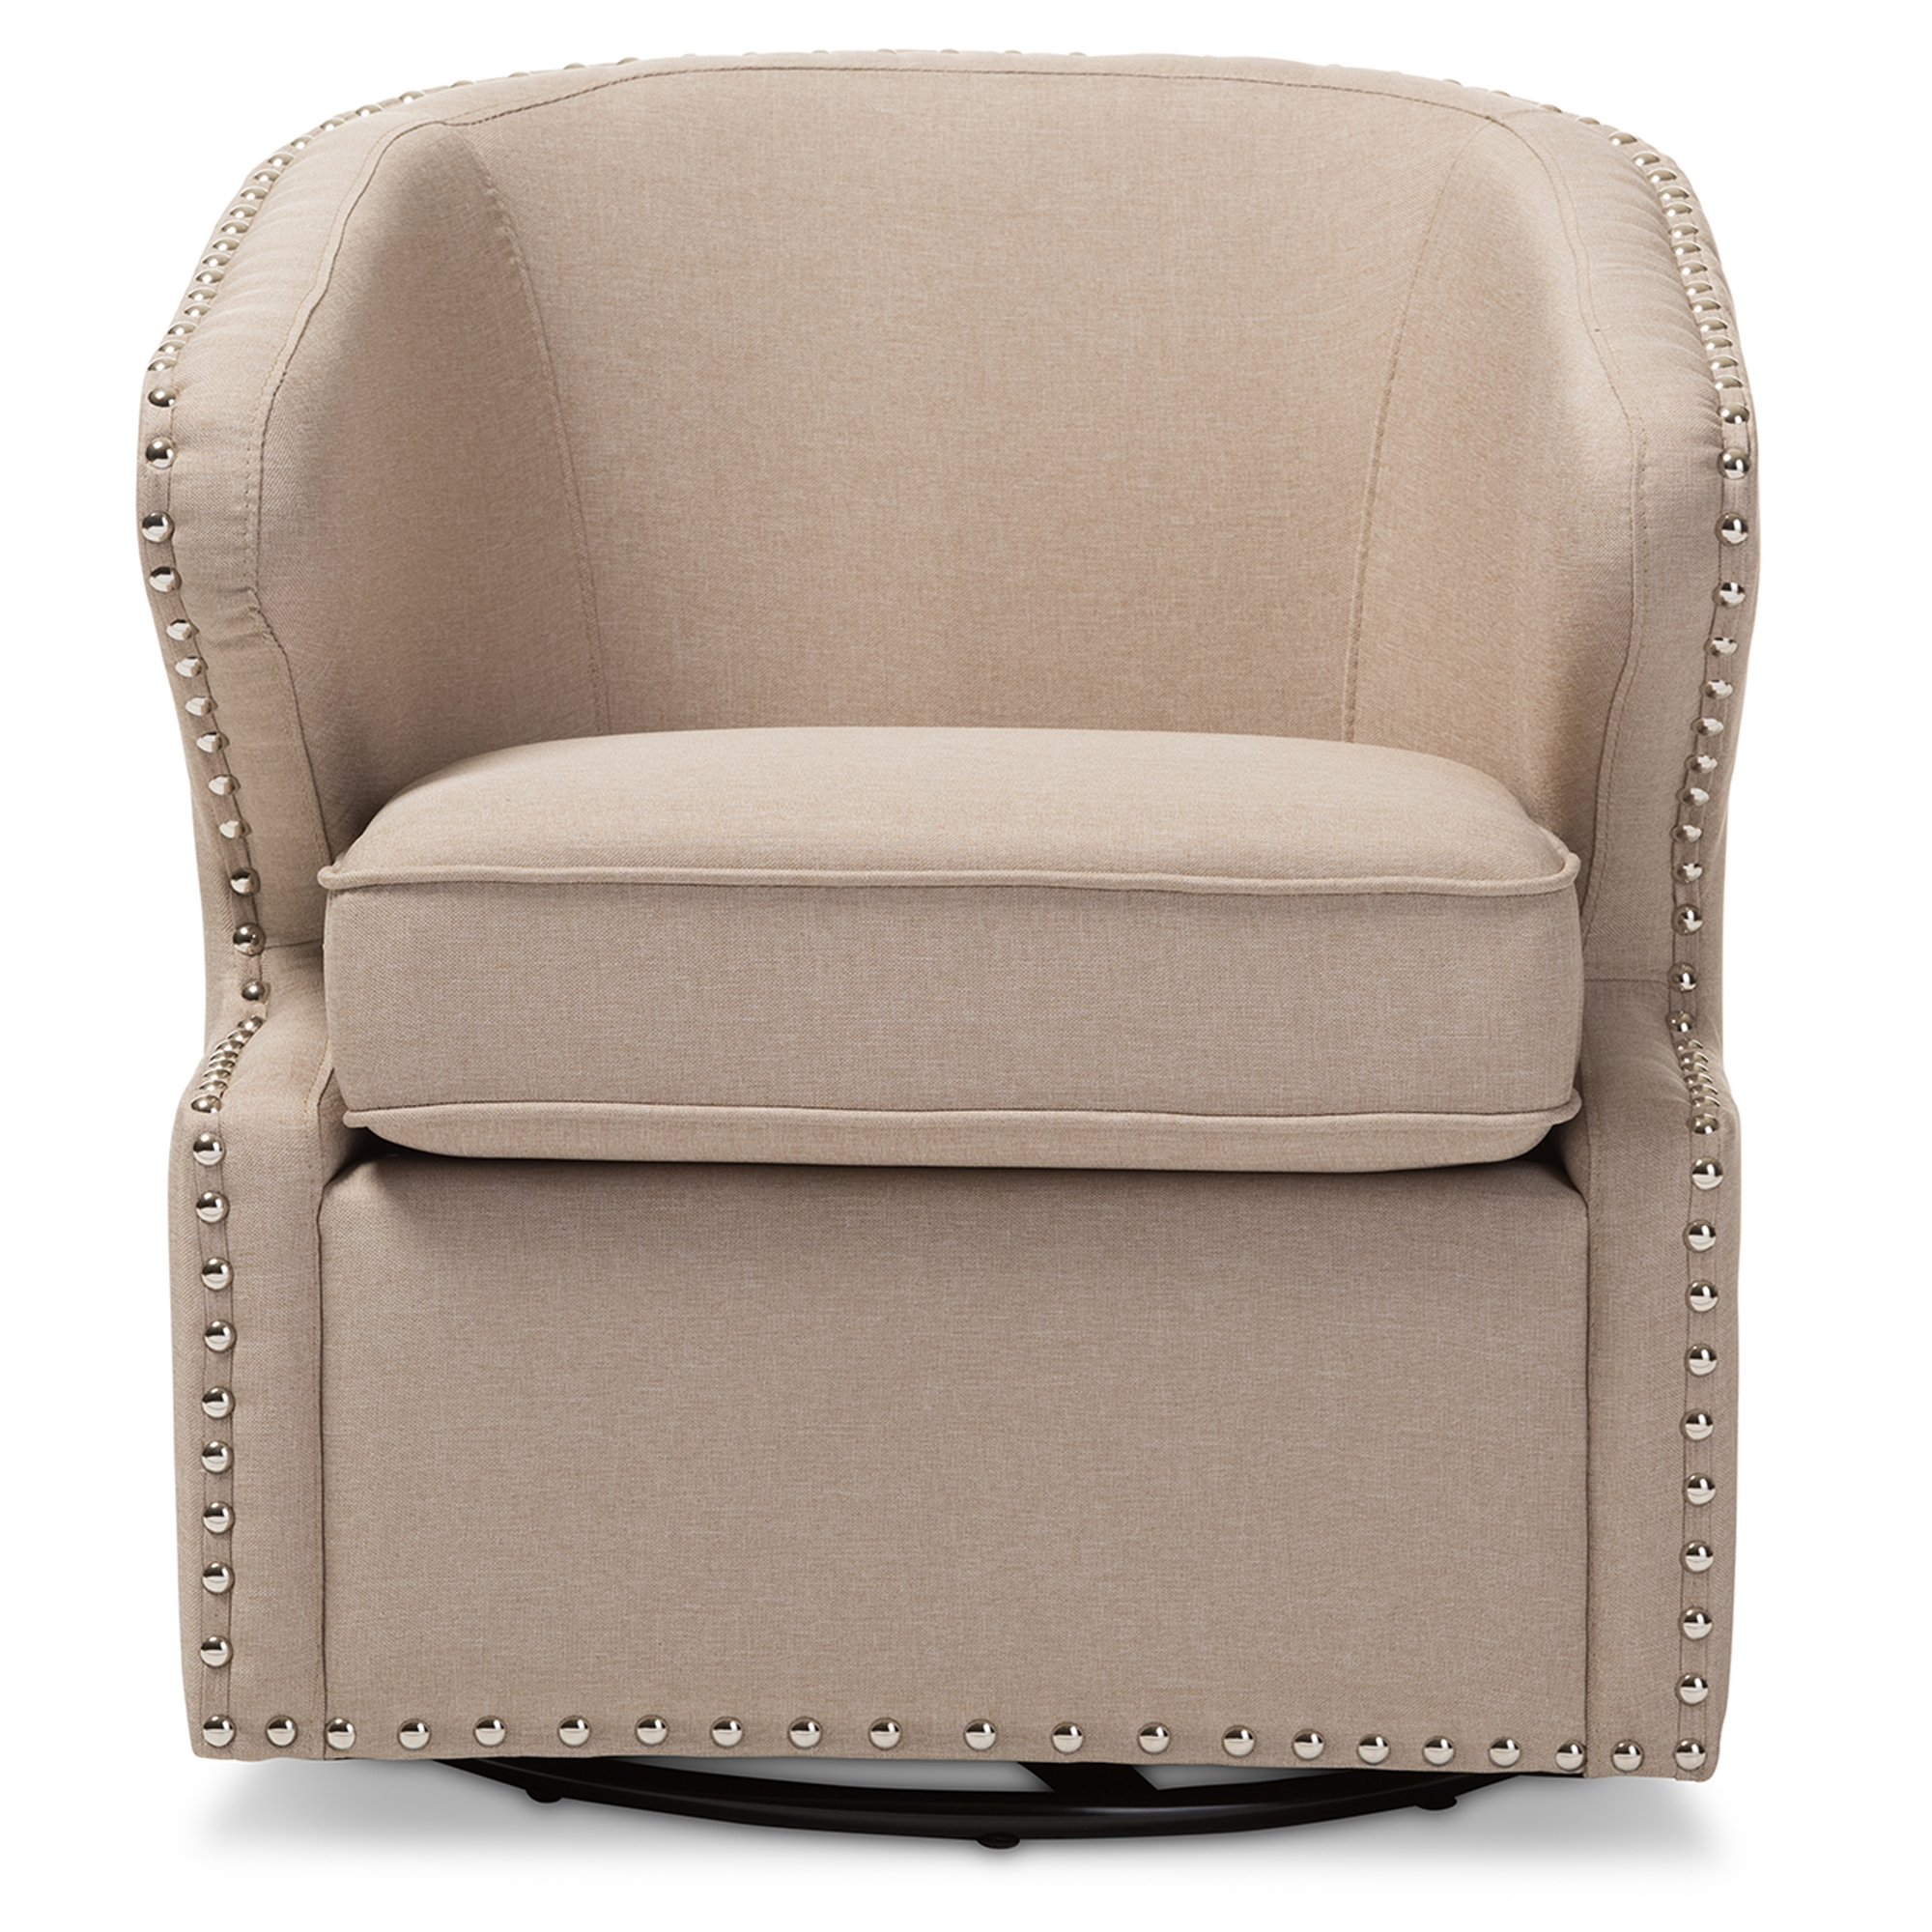 Baxton Studio   Wholesale Accent Chair   Wholesale Living Room Furniture    Wholesale Furniture